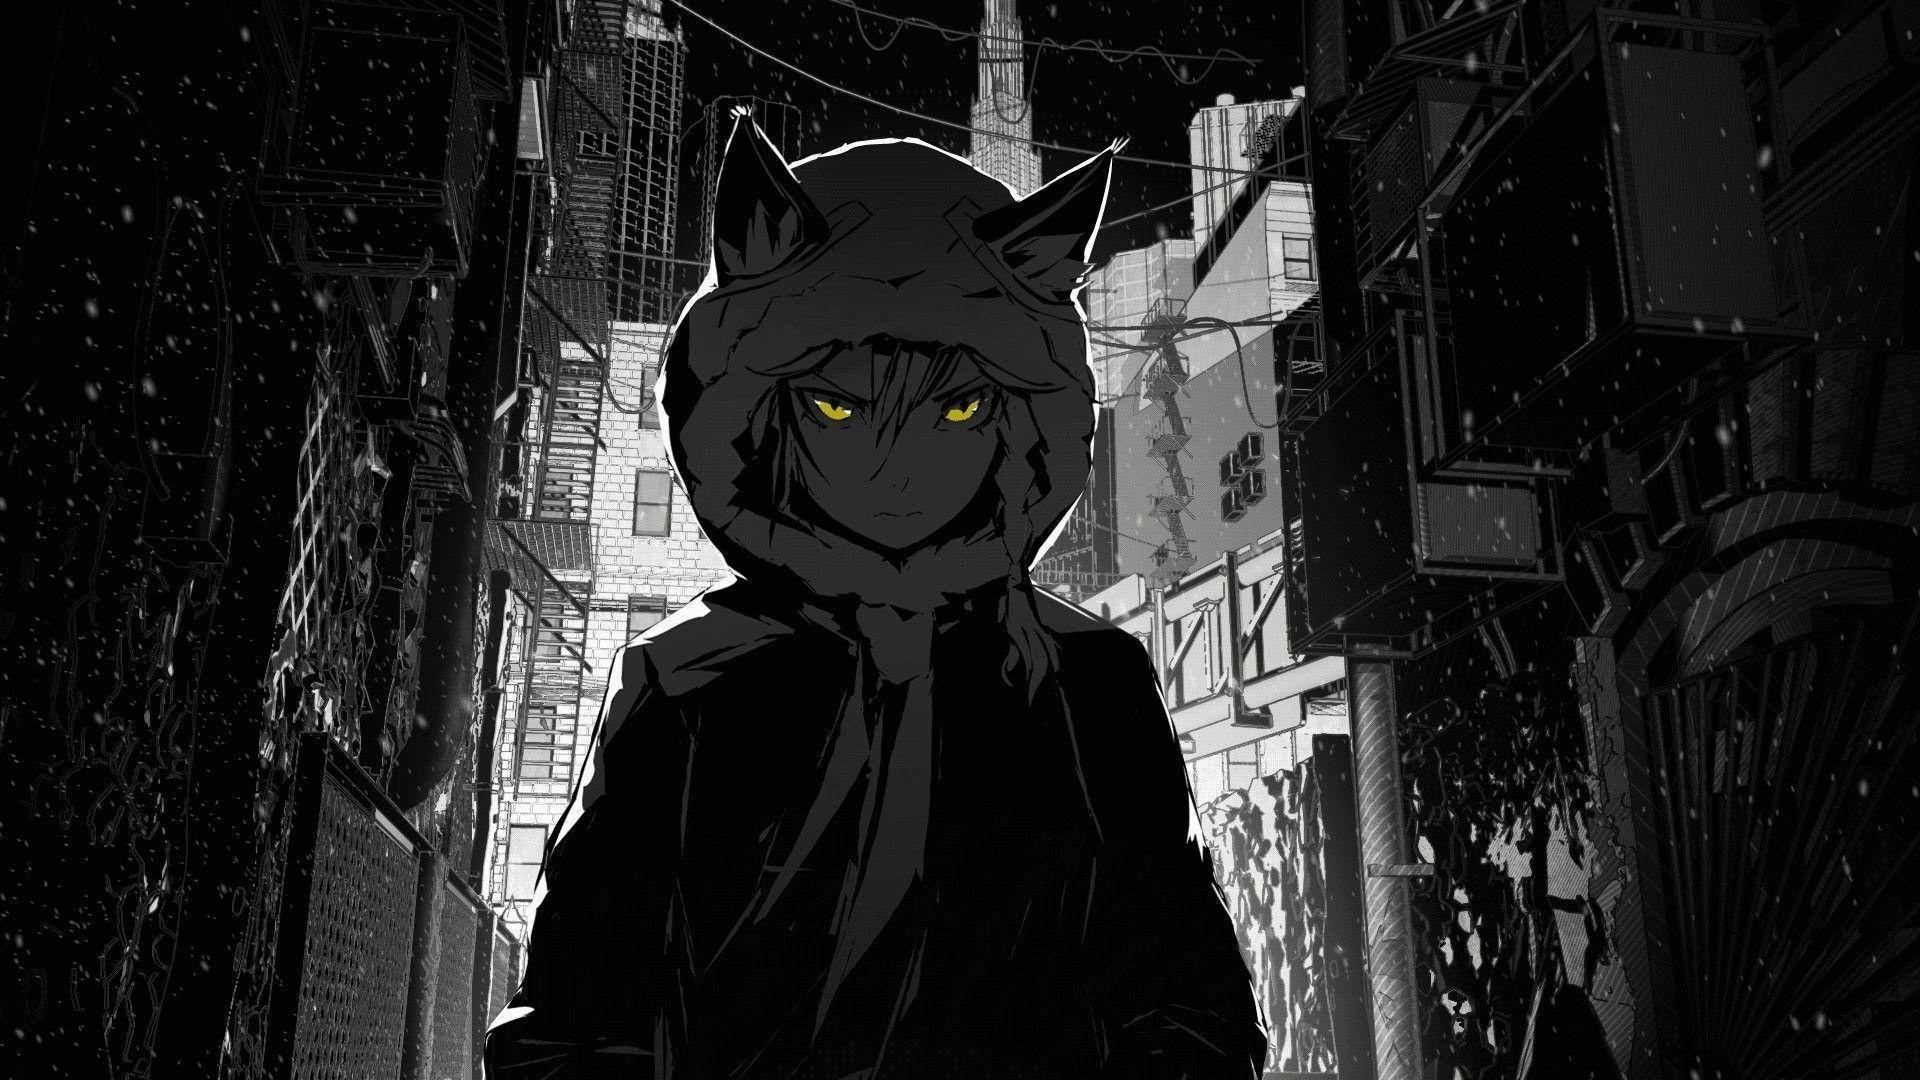 anime dark wallpapers px resolution wallpapersafari code